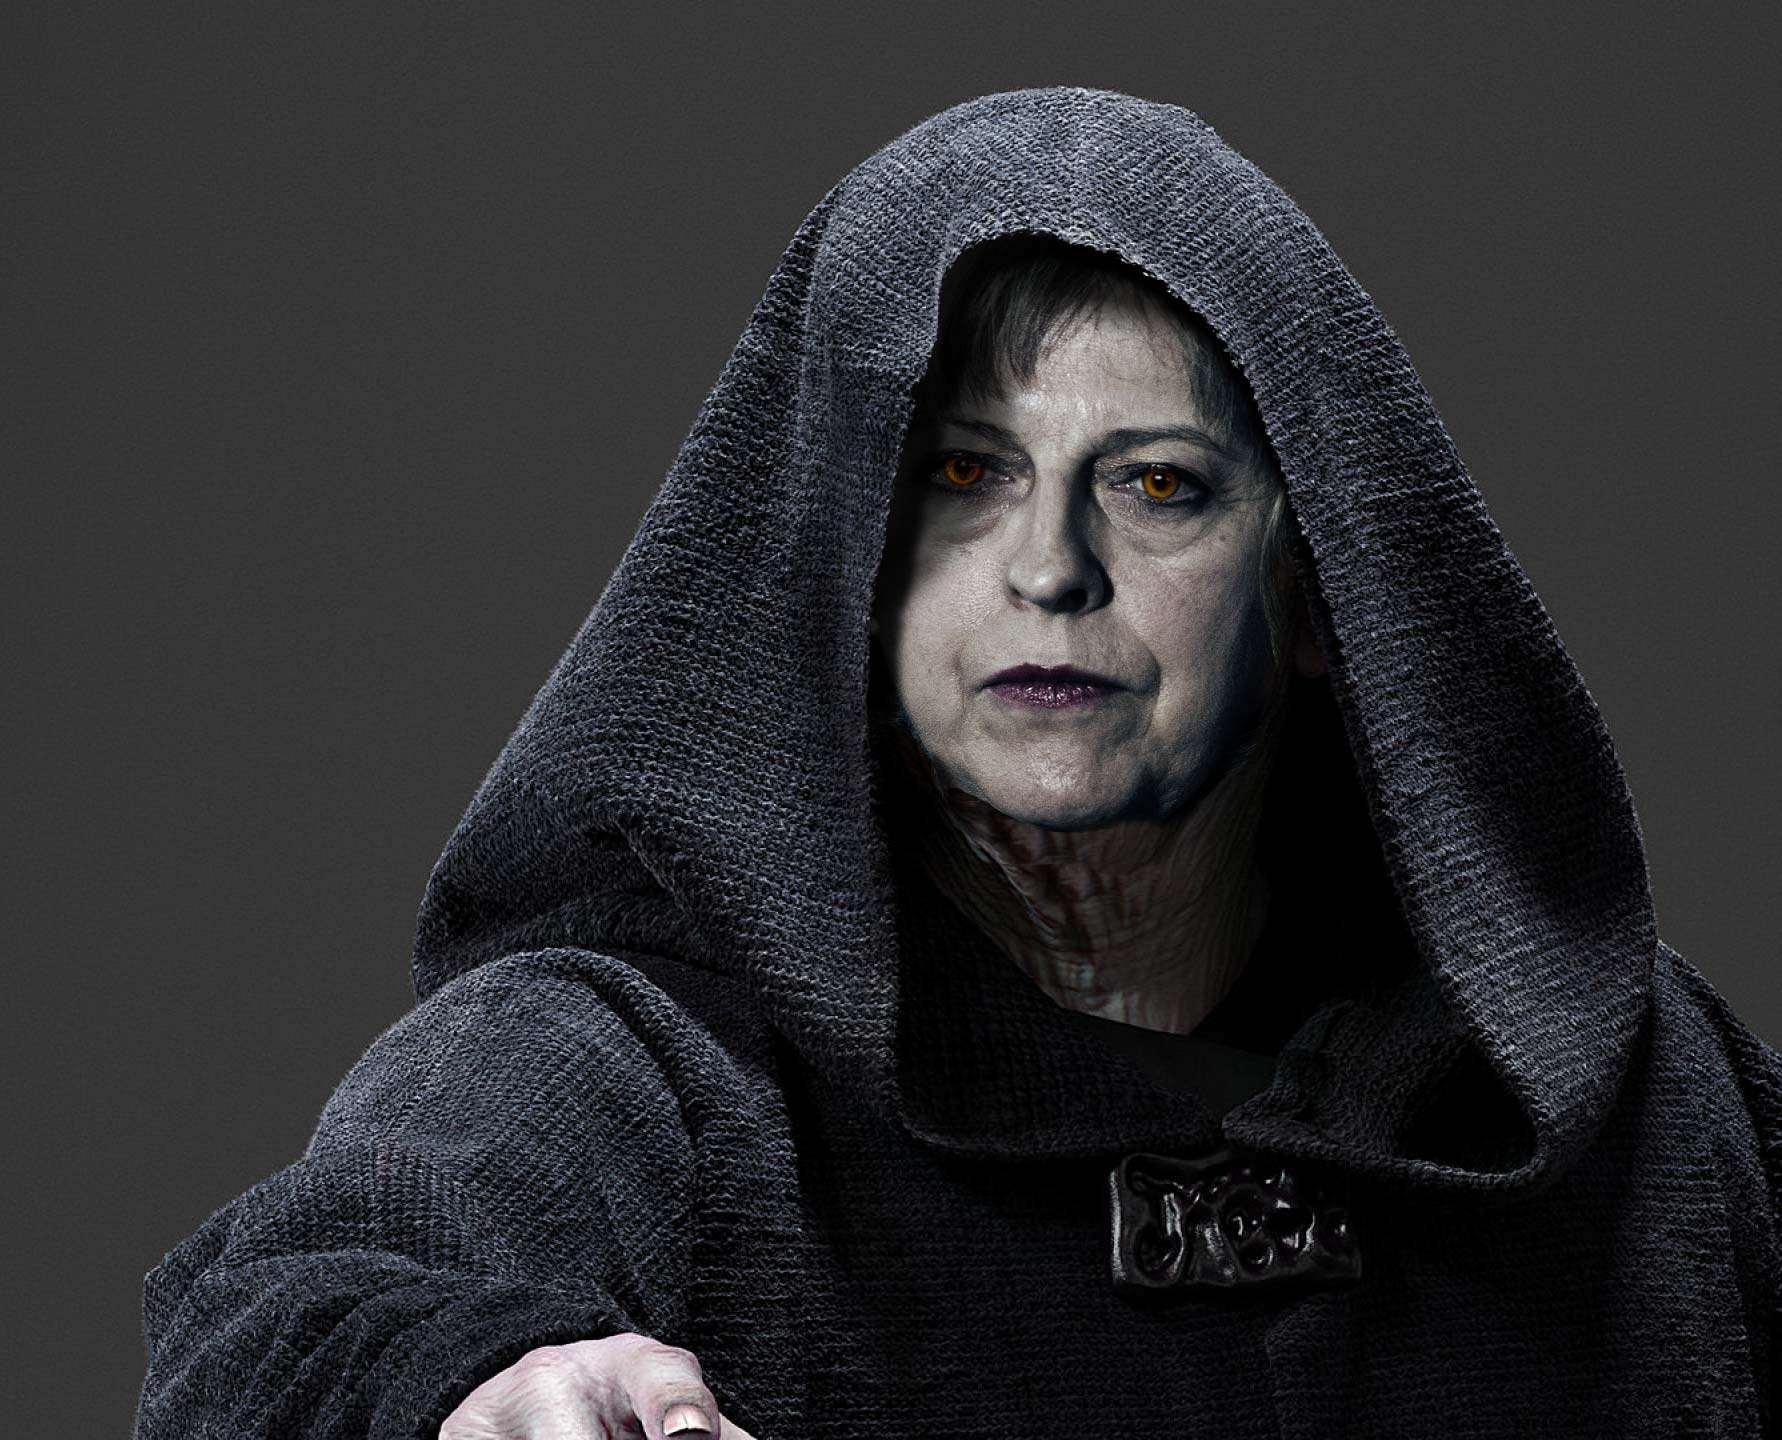 Emperor Theresa Palpatine